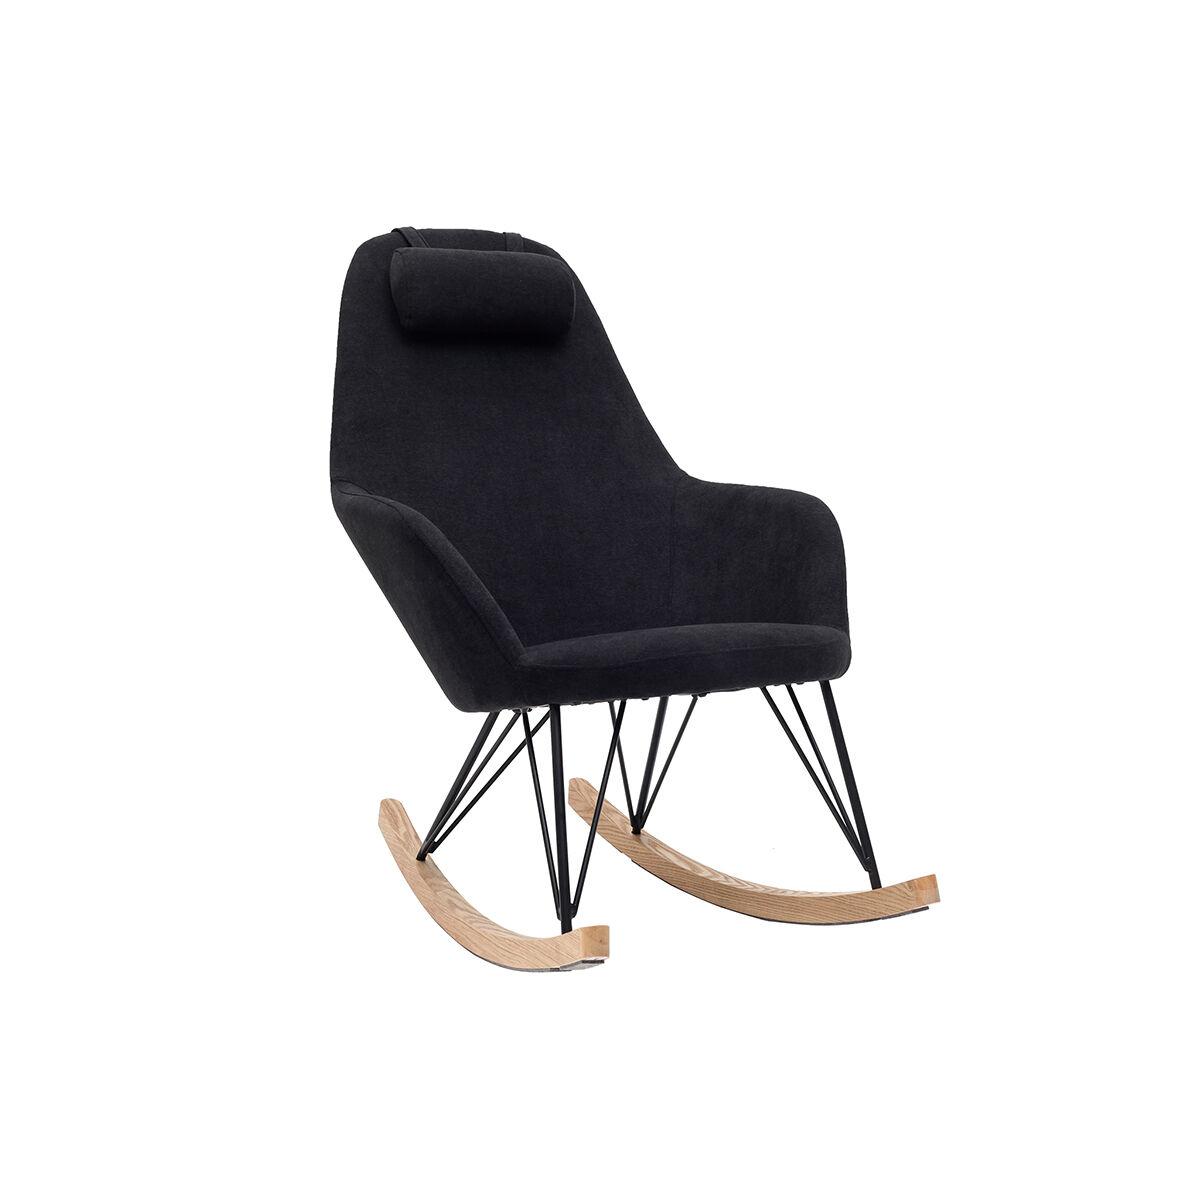 Miliboo Rocking chair en tissu effet velours noir avec pieds métal et frêne JHENE